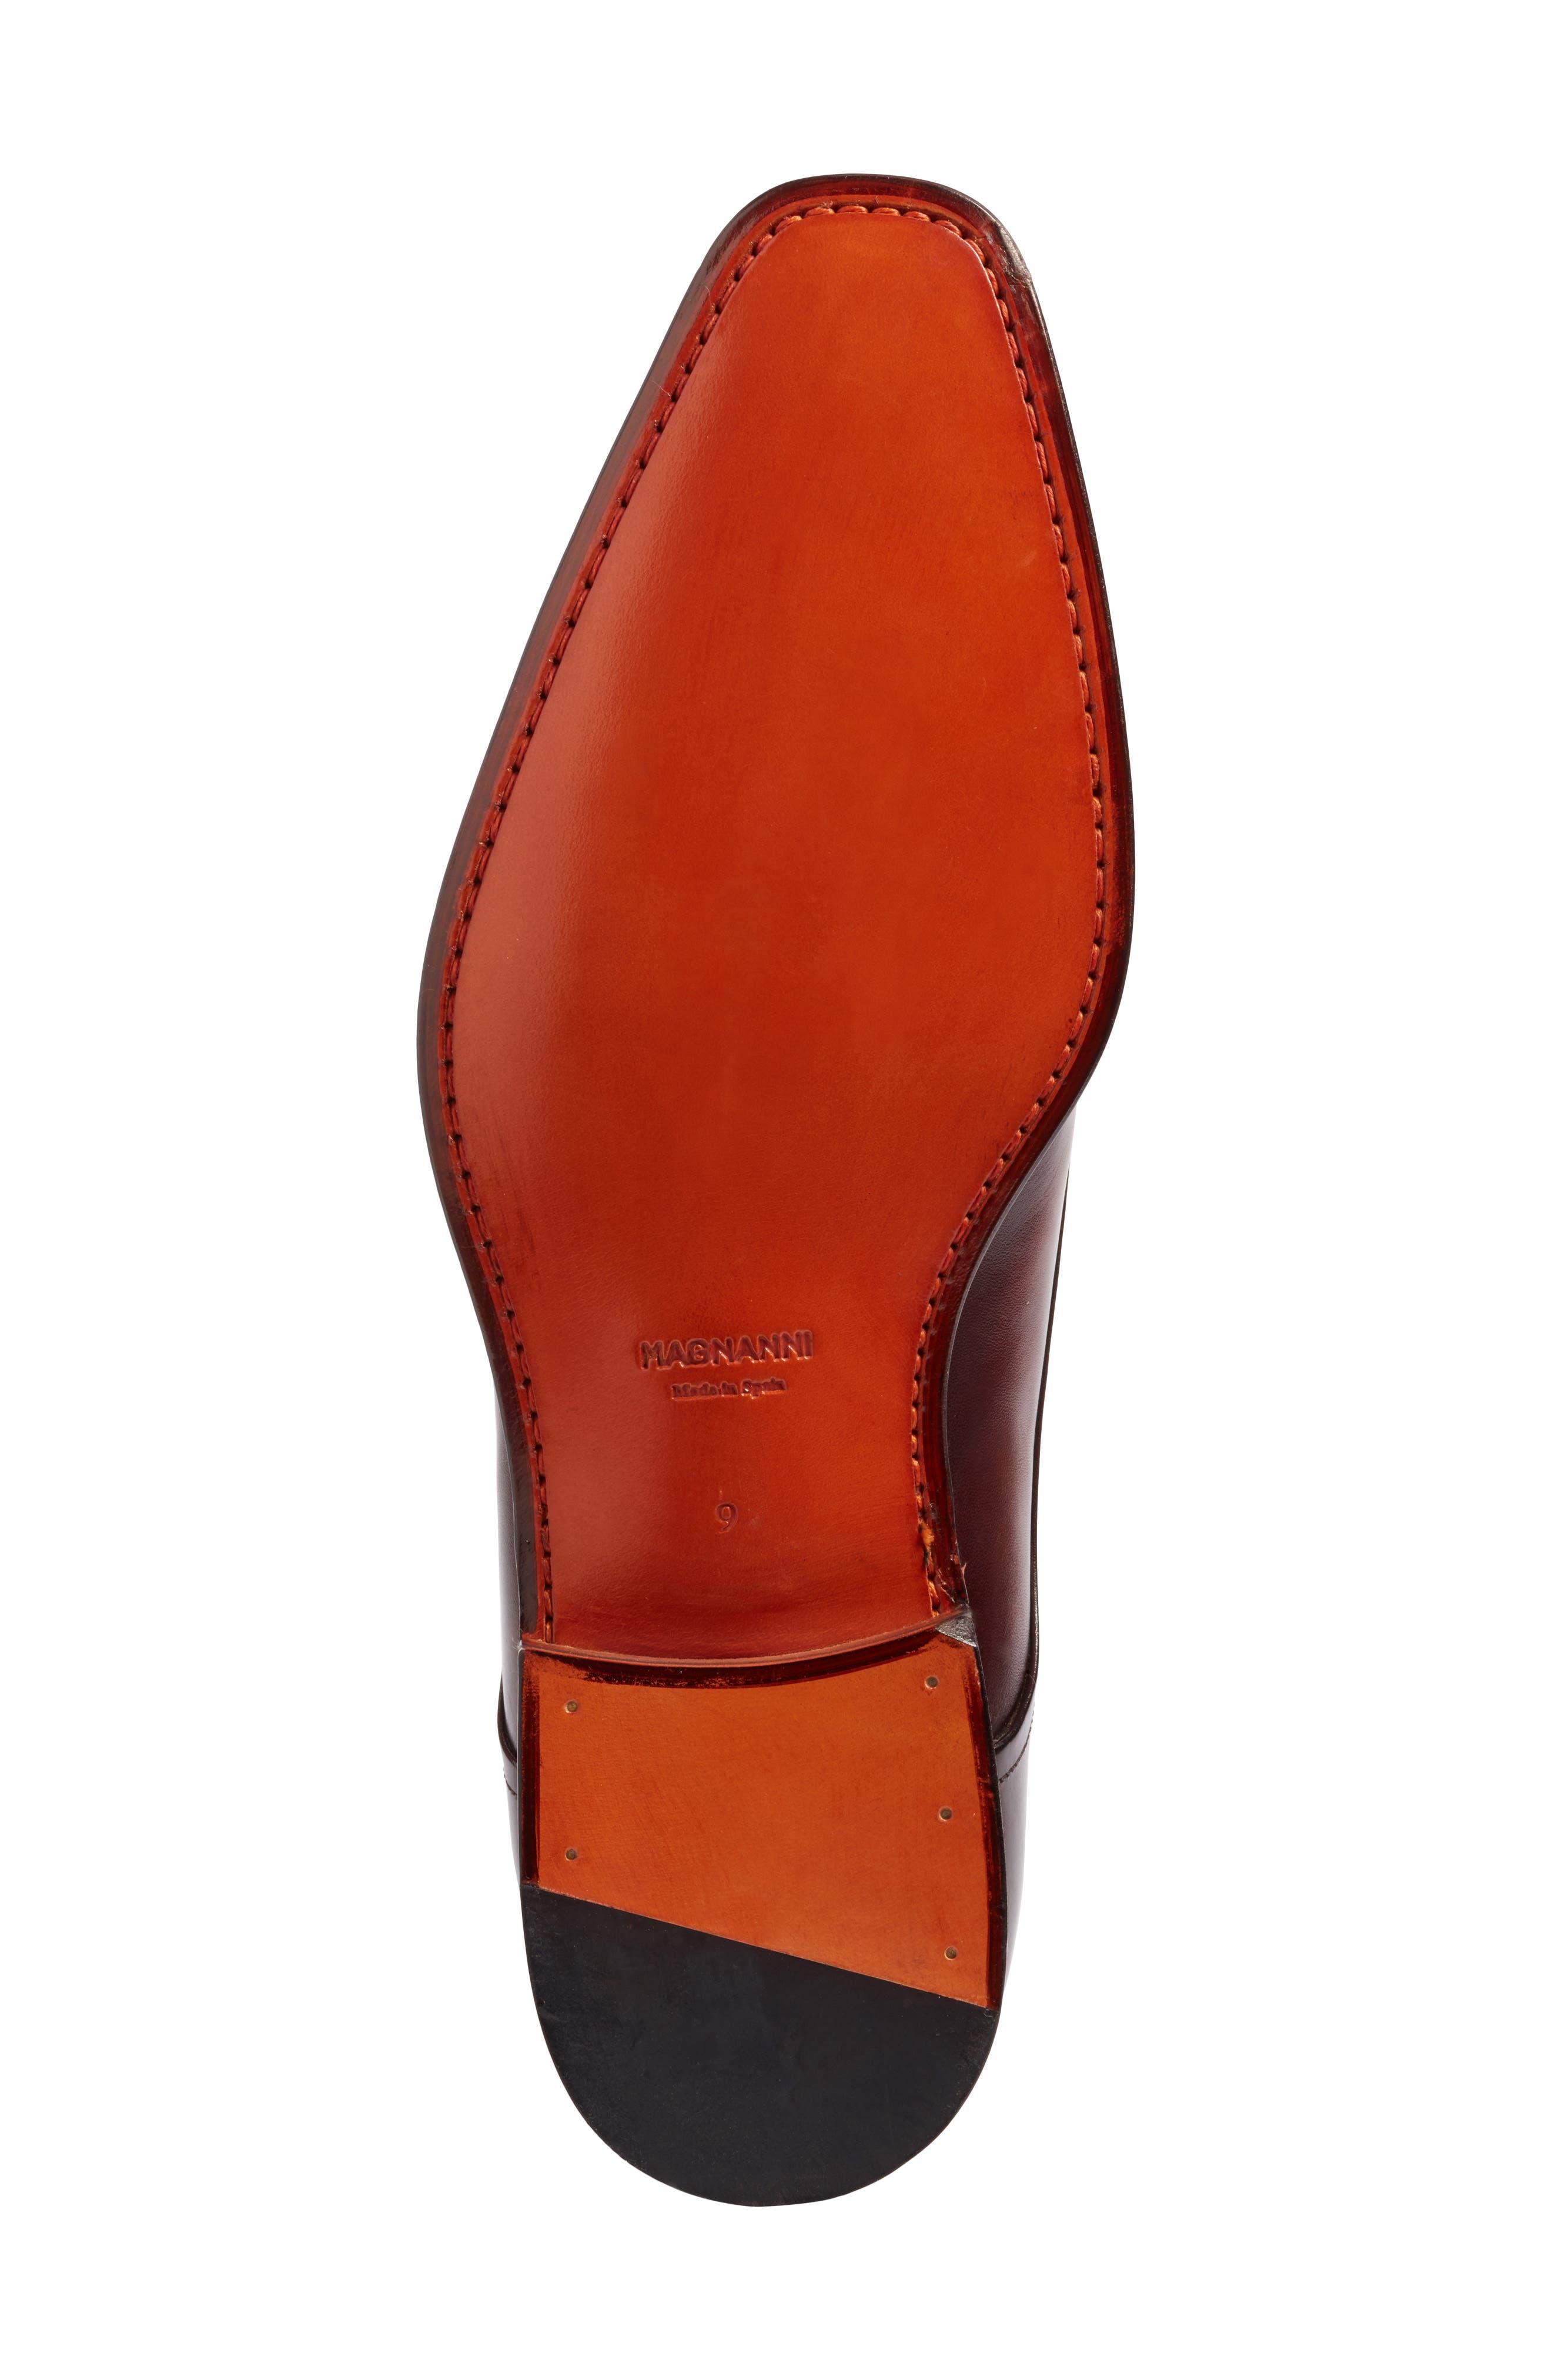 Silvio Double Monk Strap Shoe,                             Alternate thumbnail 6, color,                             TOBACCO LEATHER